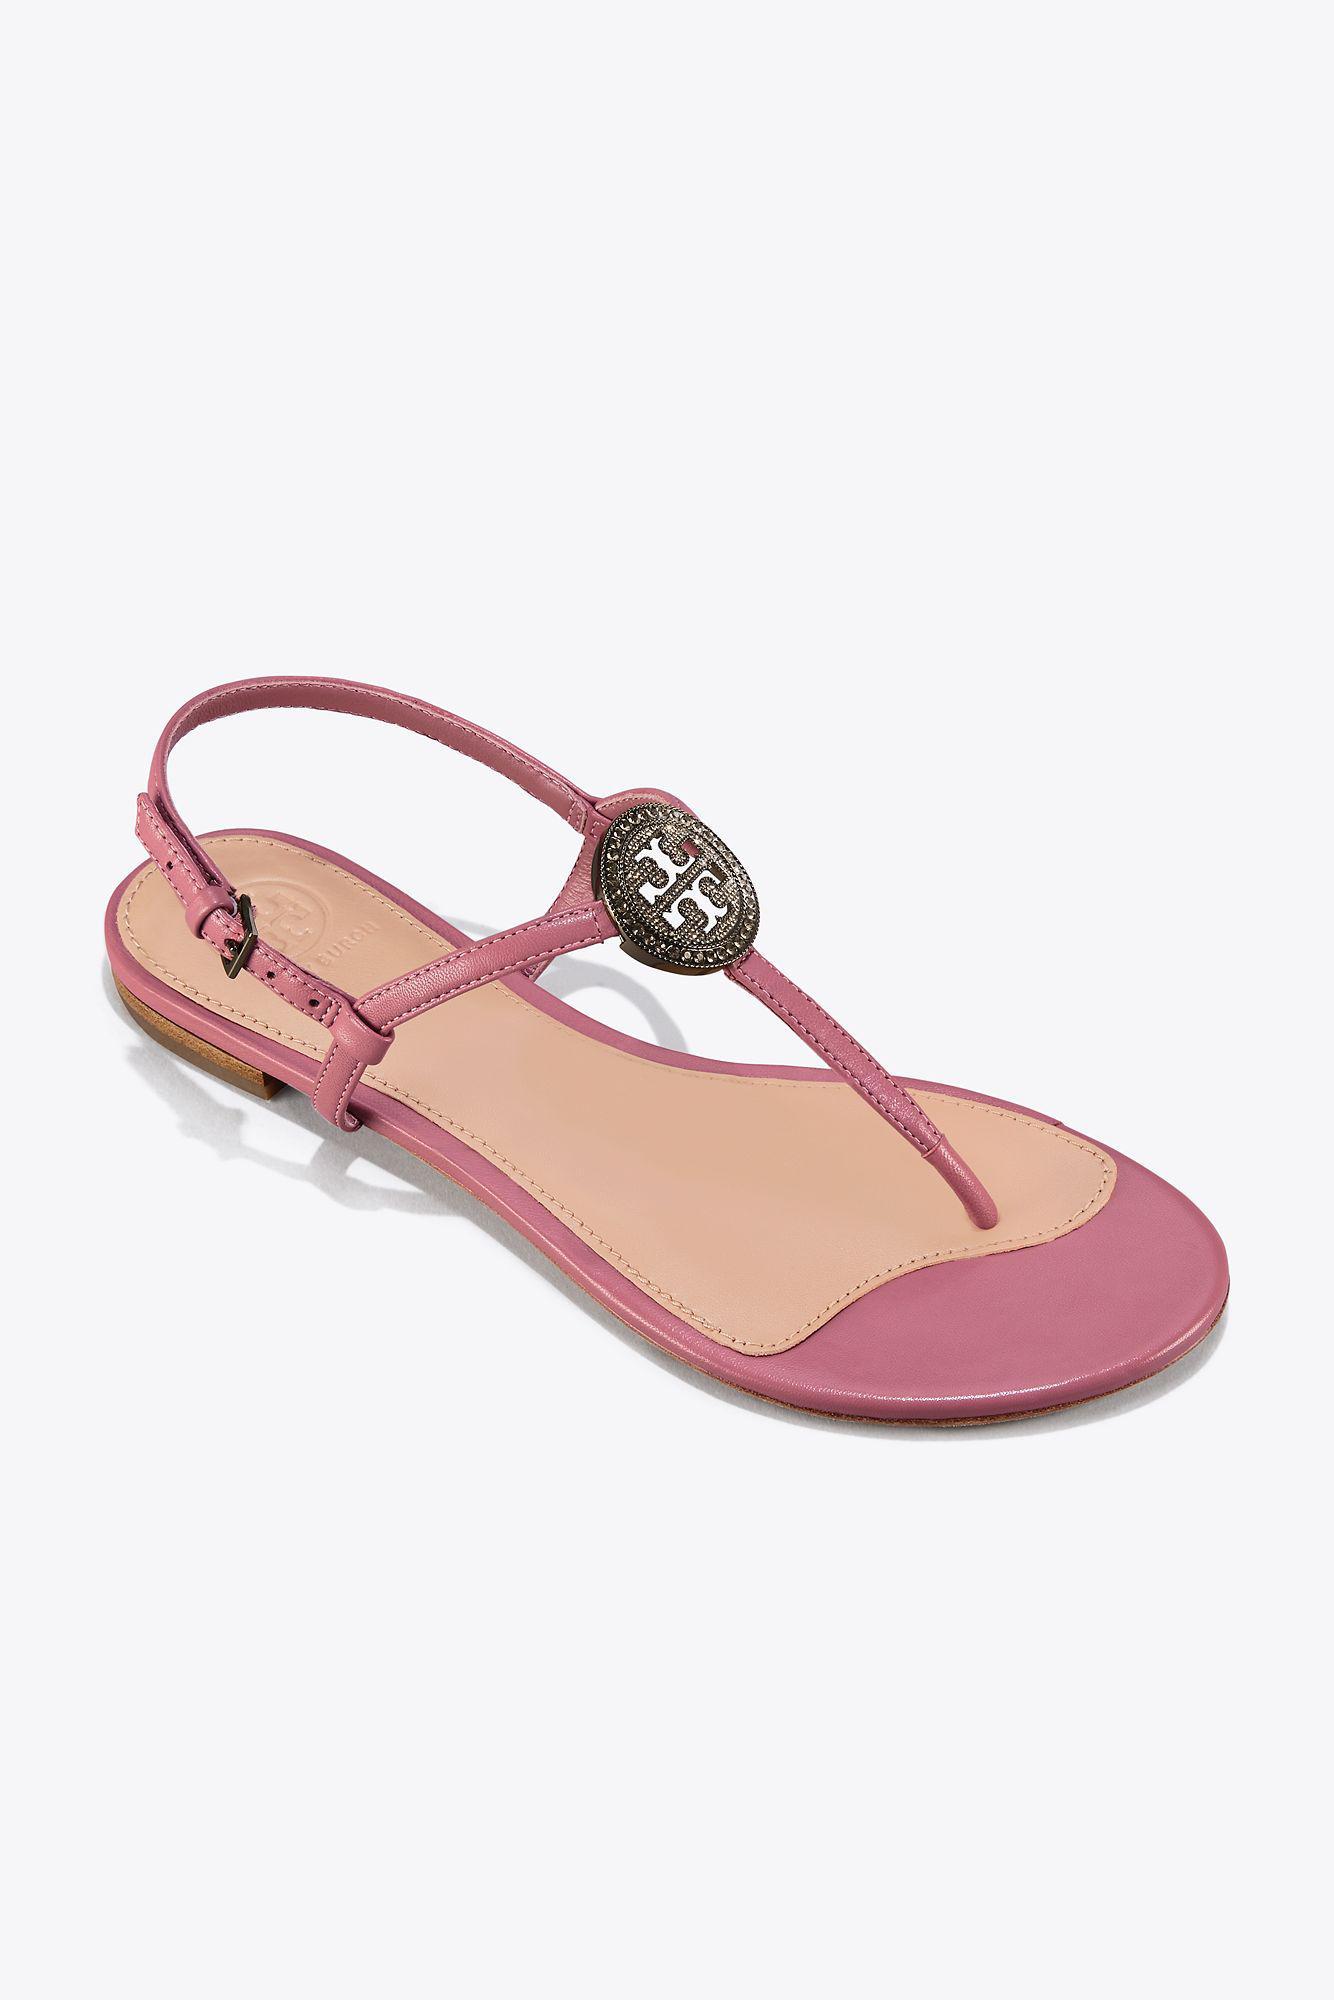 1bb1360b321b Lyst - Tory Burch Liana Flat Sandal in Pink